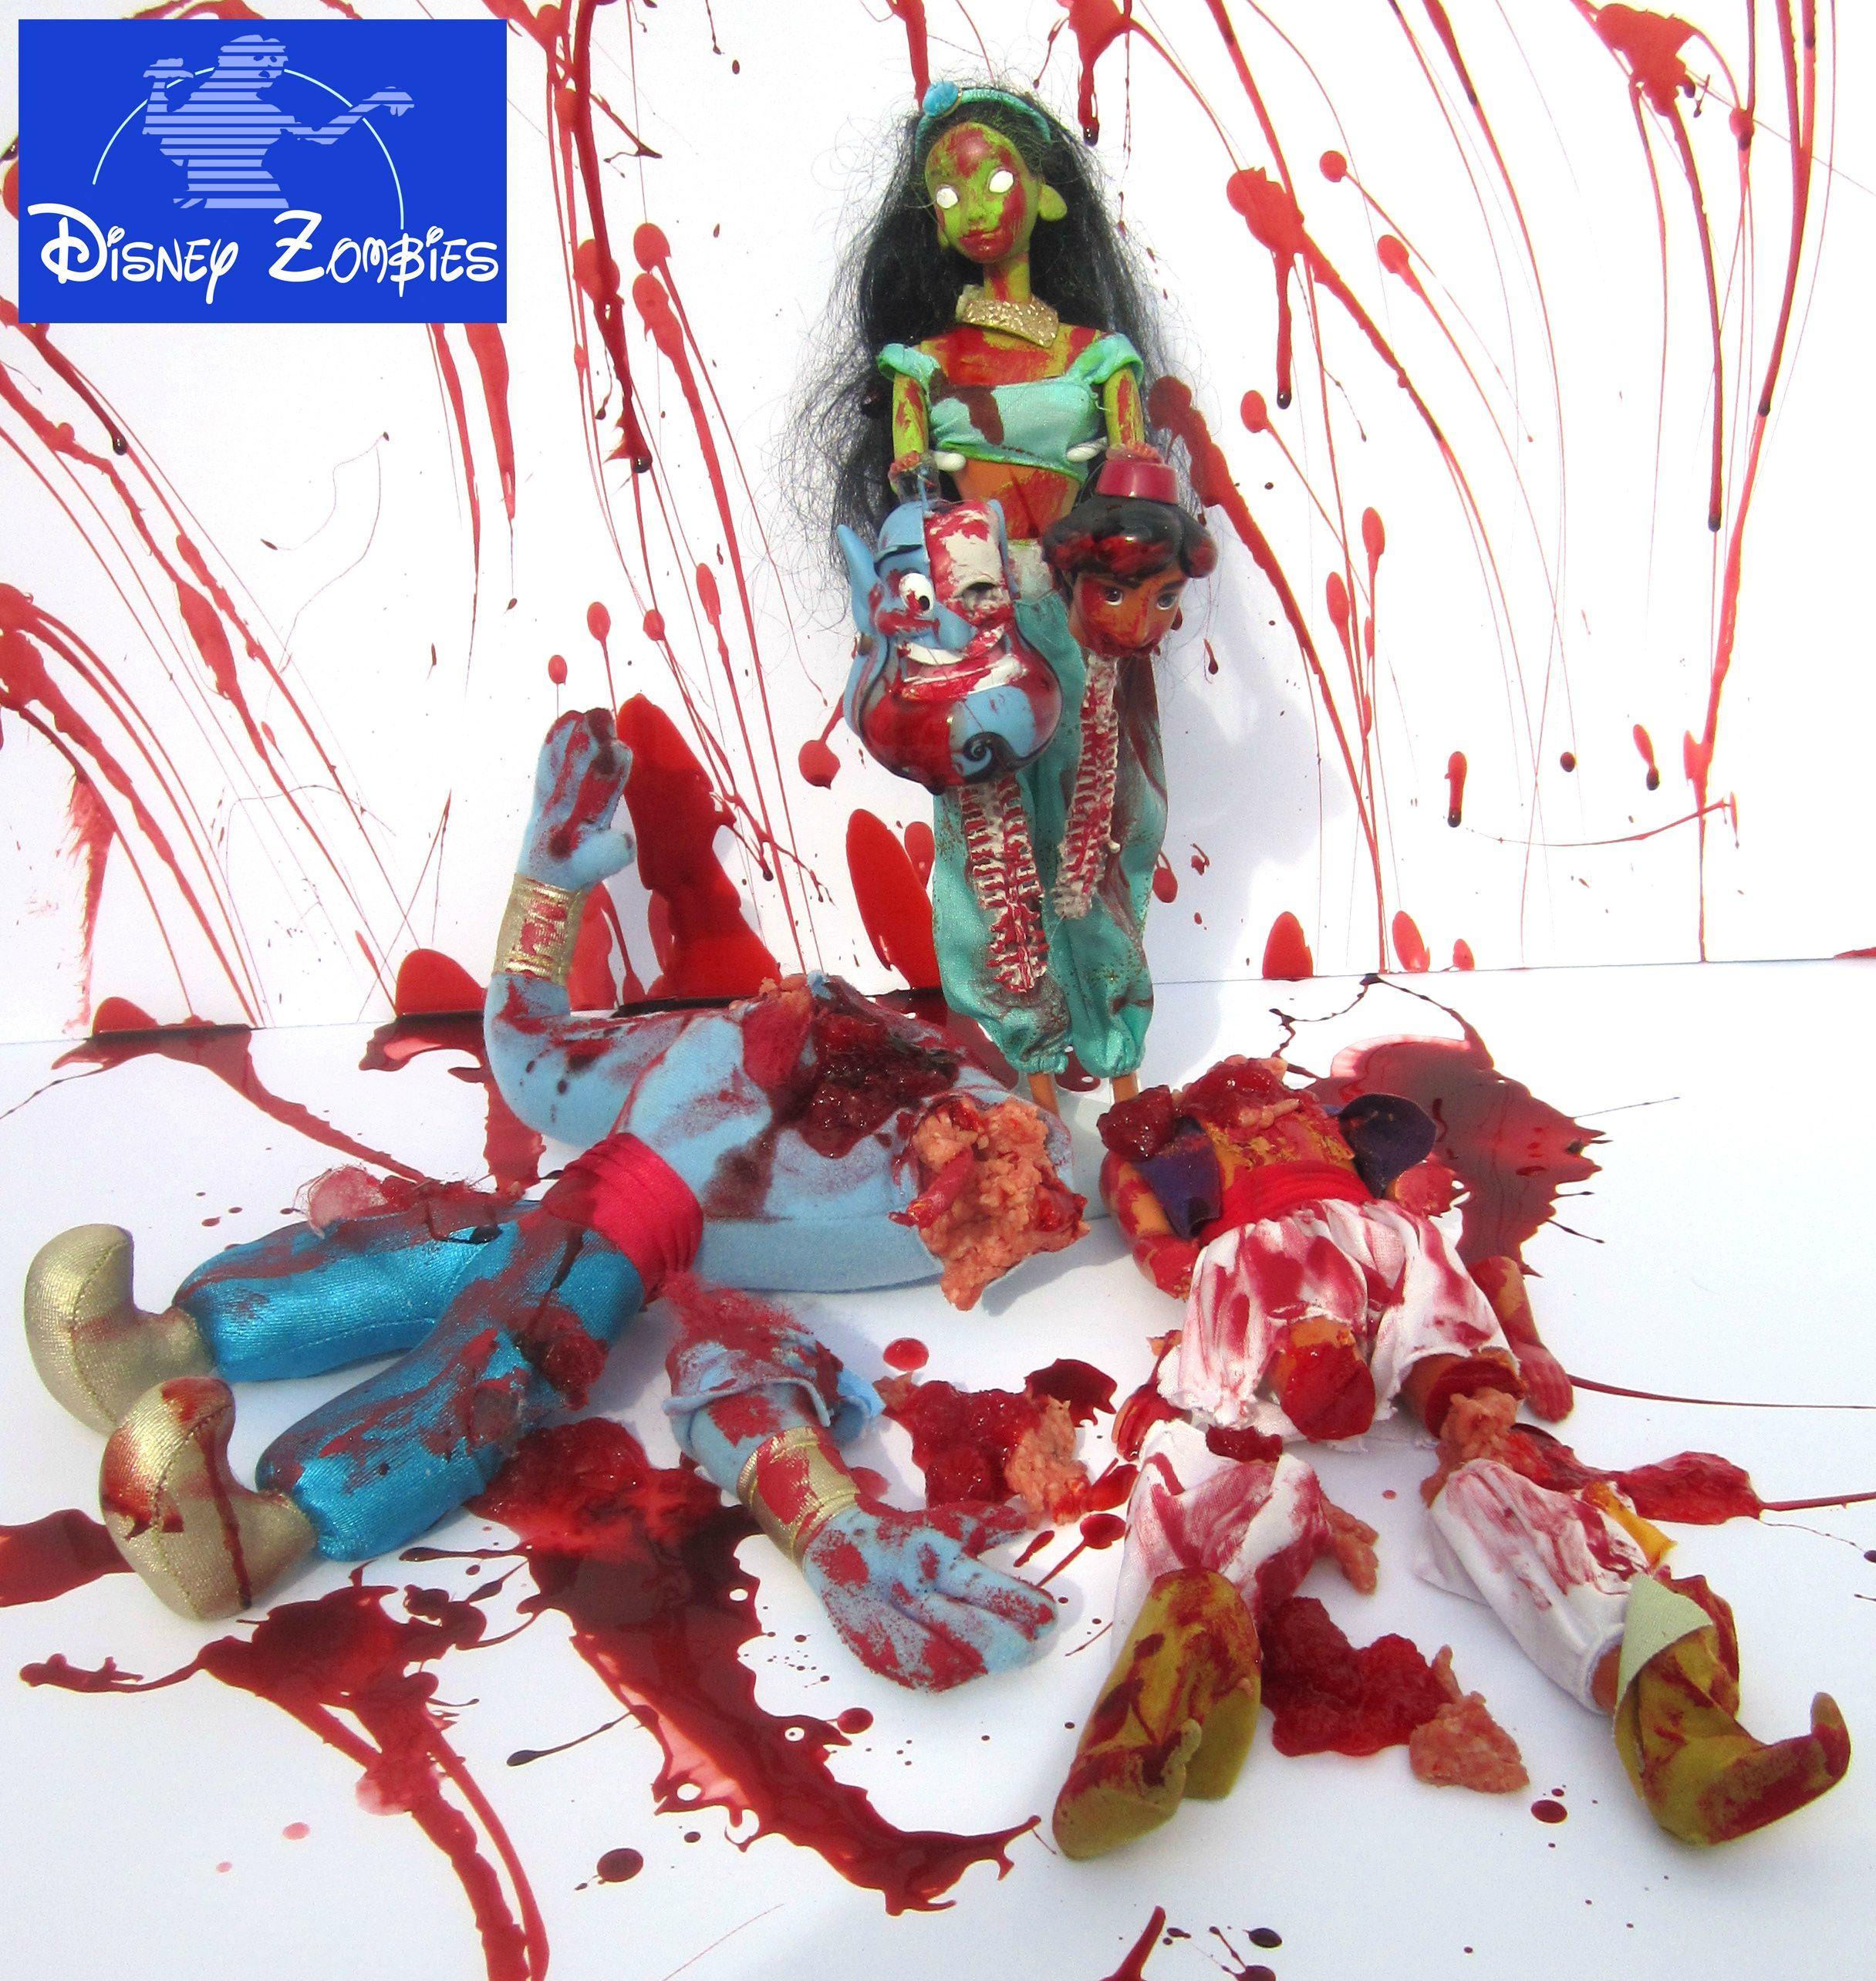 Disney Zombie Princesses By Matt Christensen Pleated Jeans